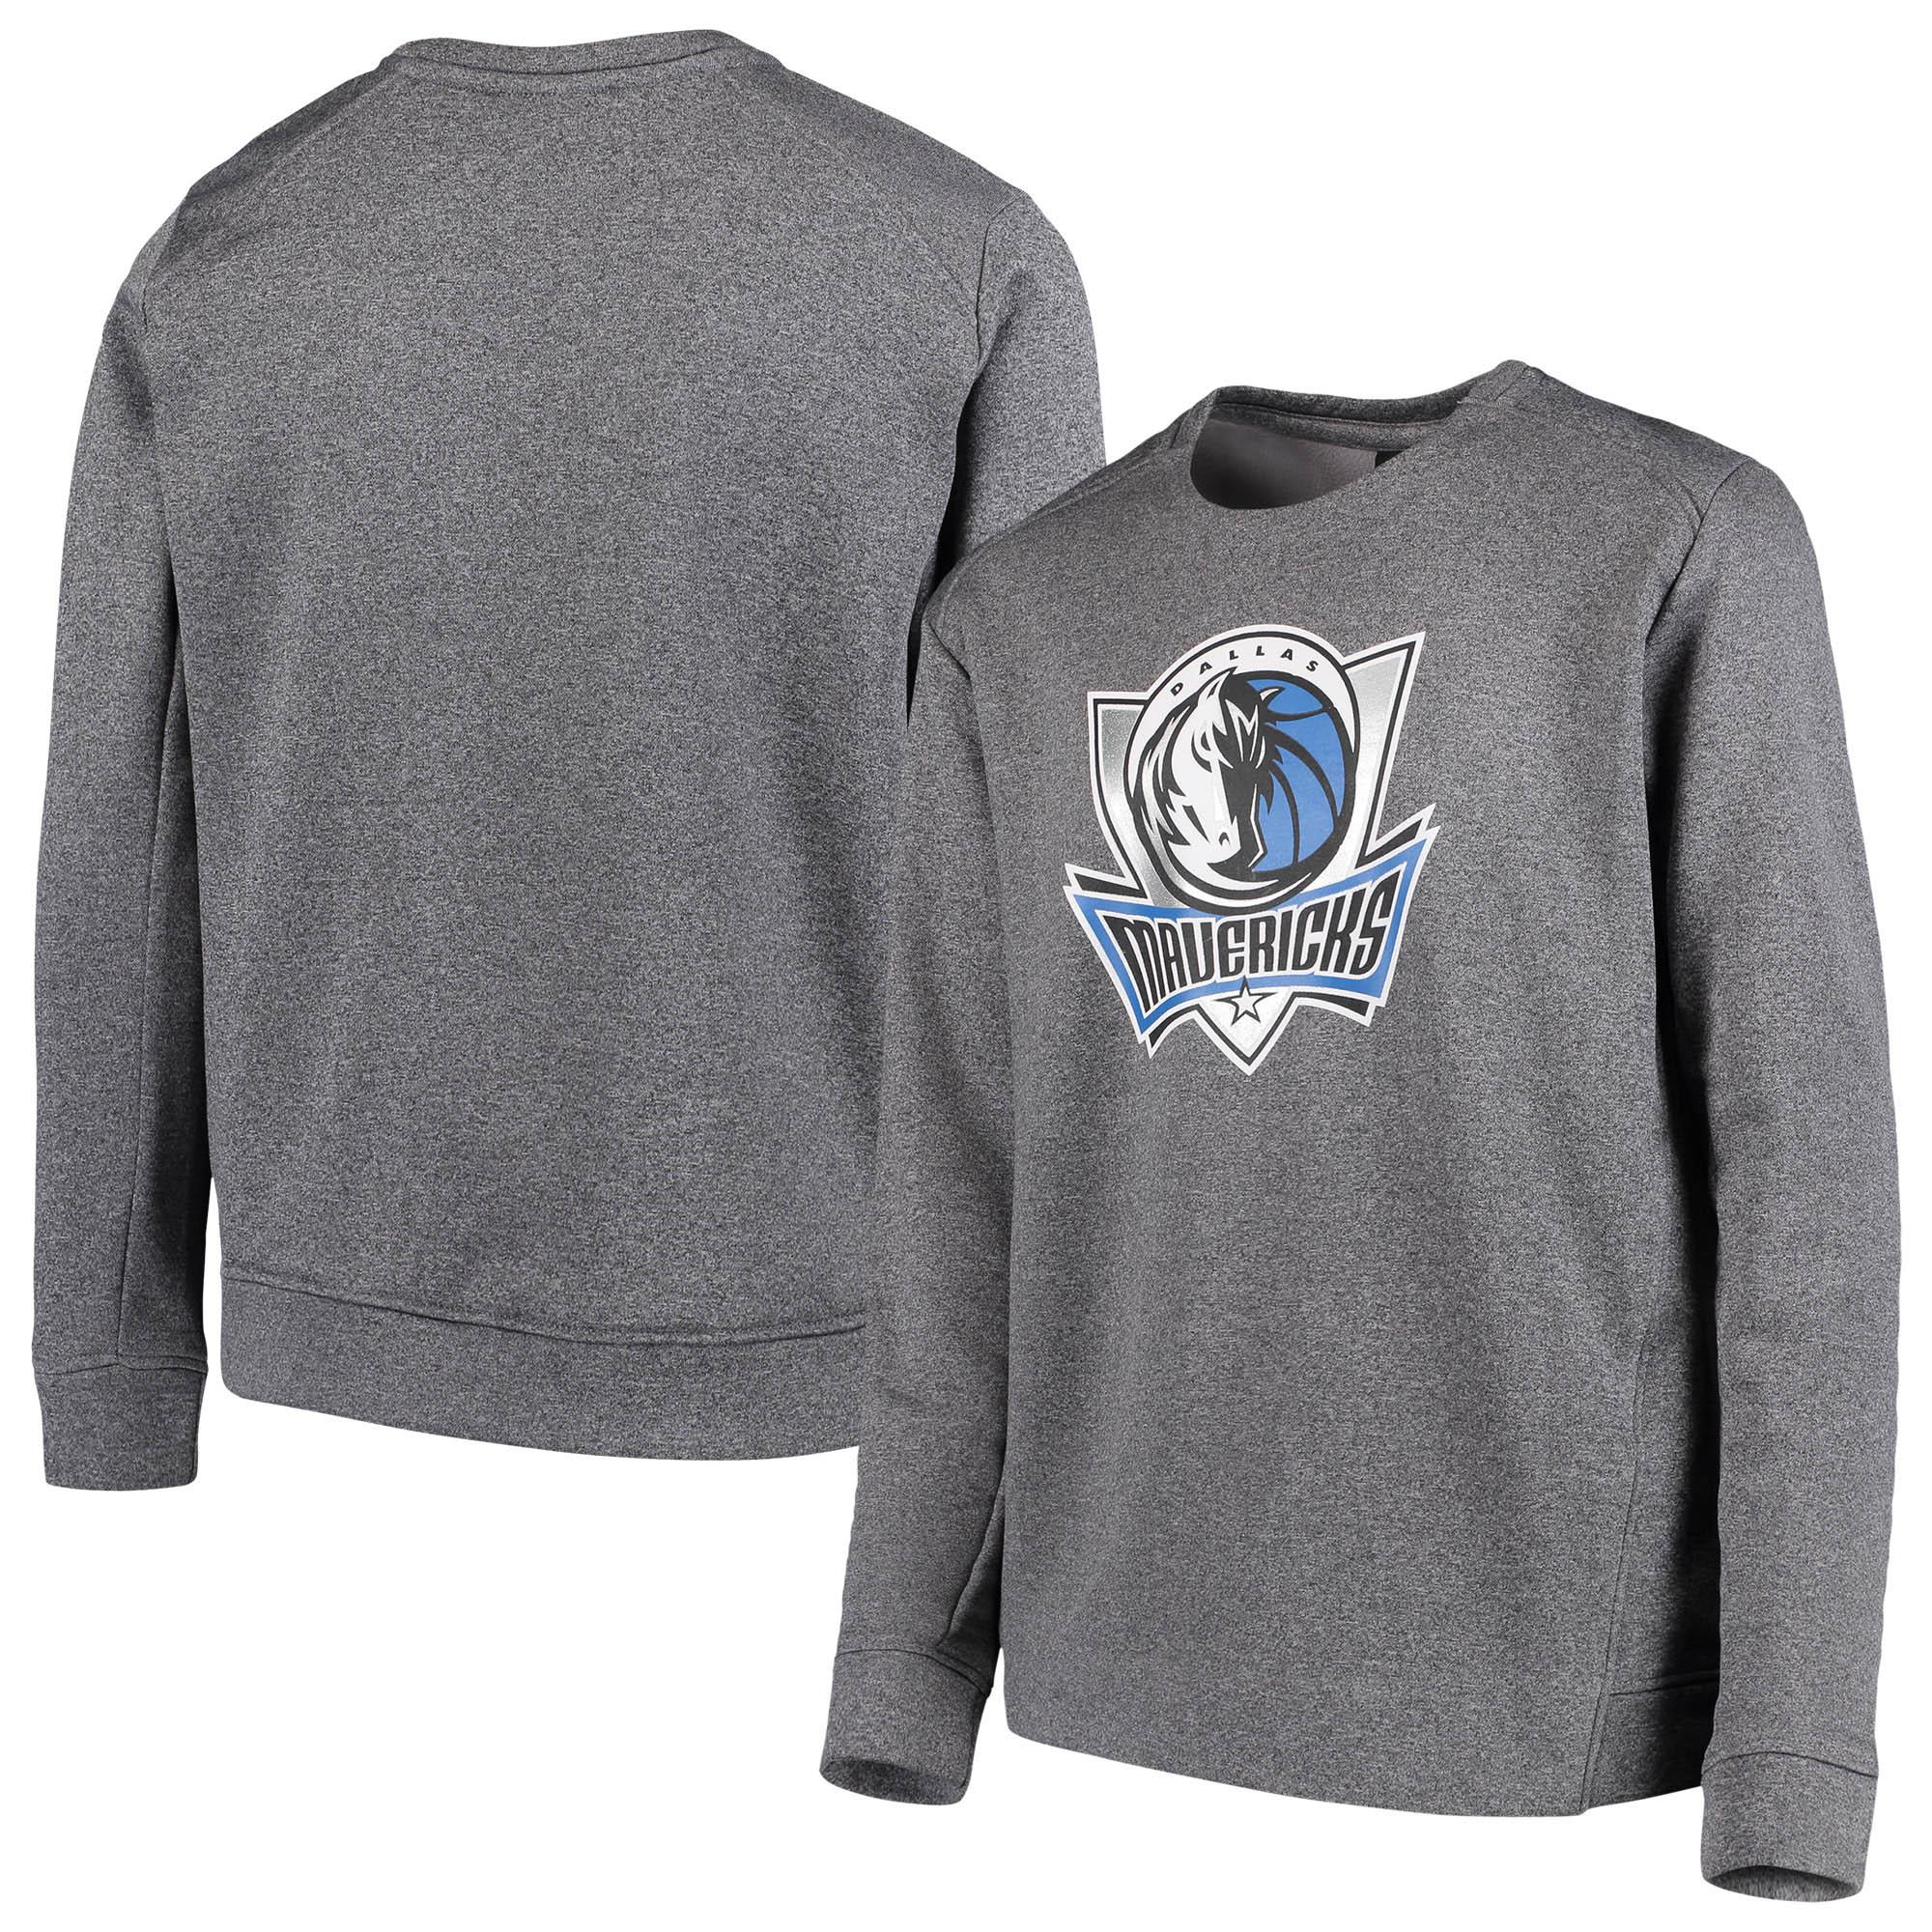 Dallas Mavericks Youth Performance Fleece Crew Sweatshirt - Heathered Gray